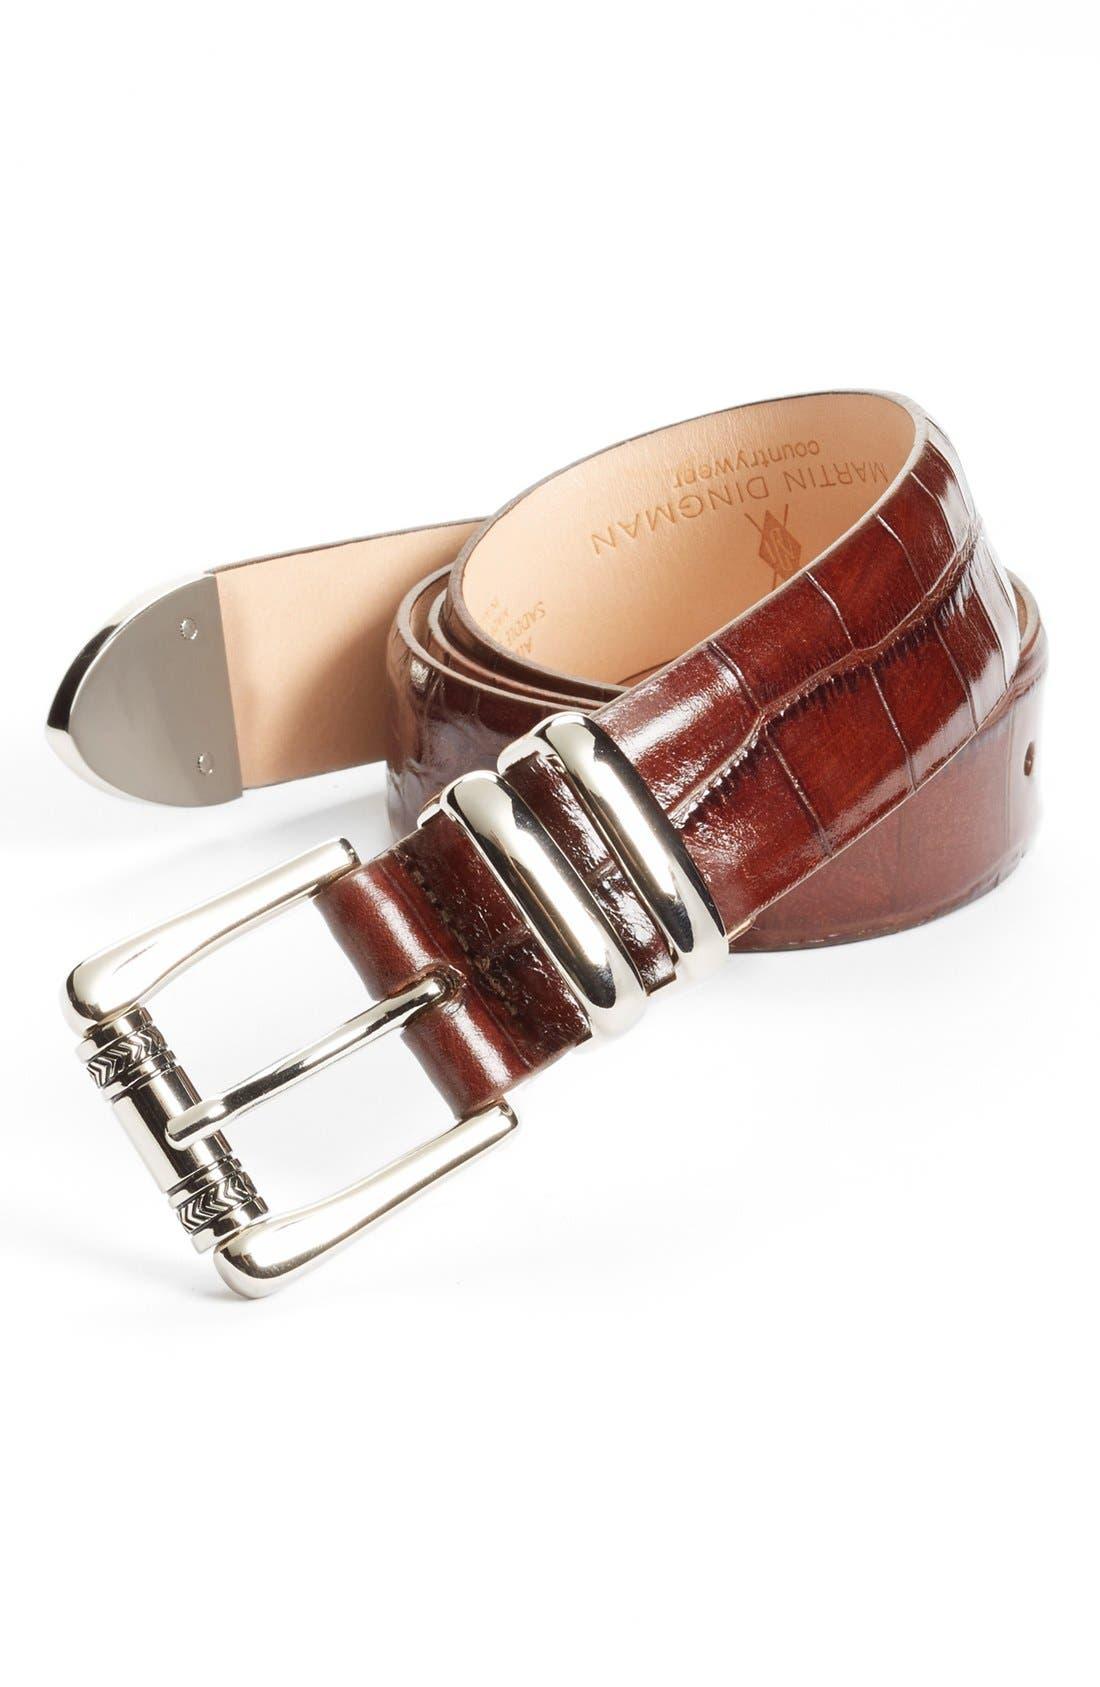 Main Image - Martin Dingman Embossed Leather Belt